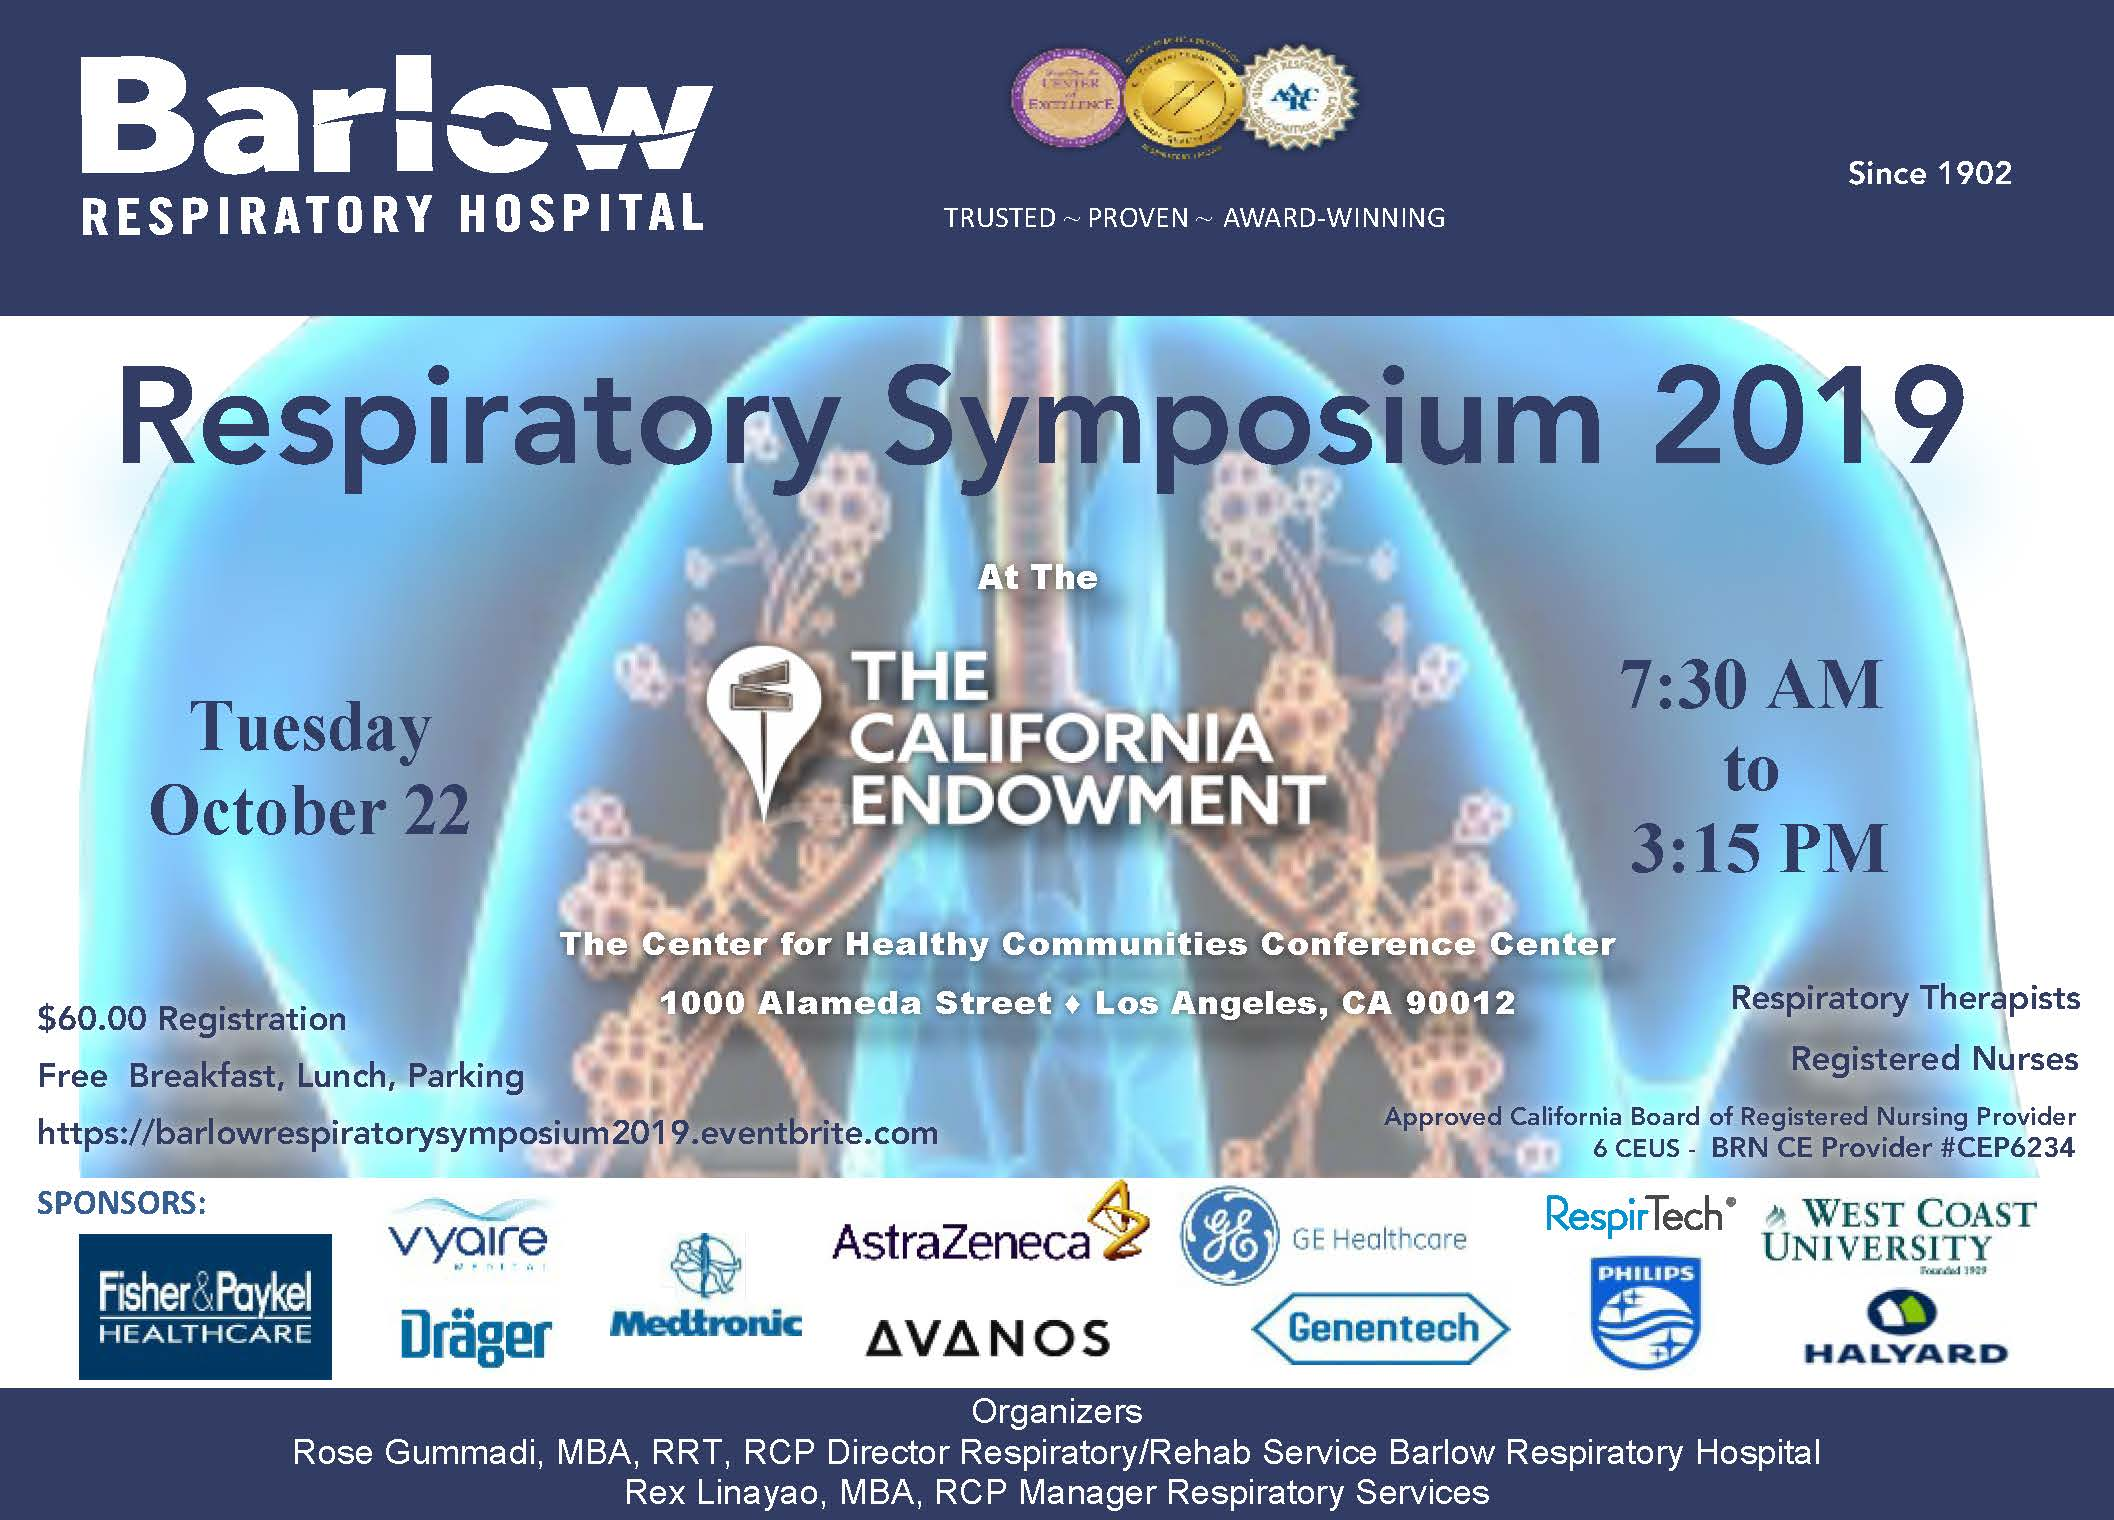 Barlow Respiratory Symposium 2019